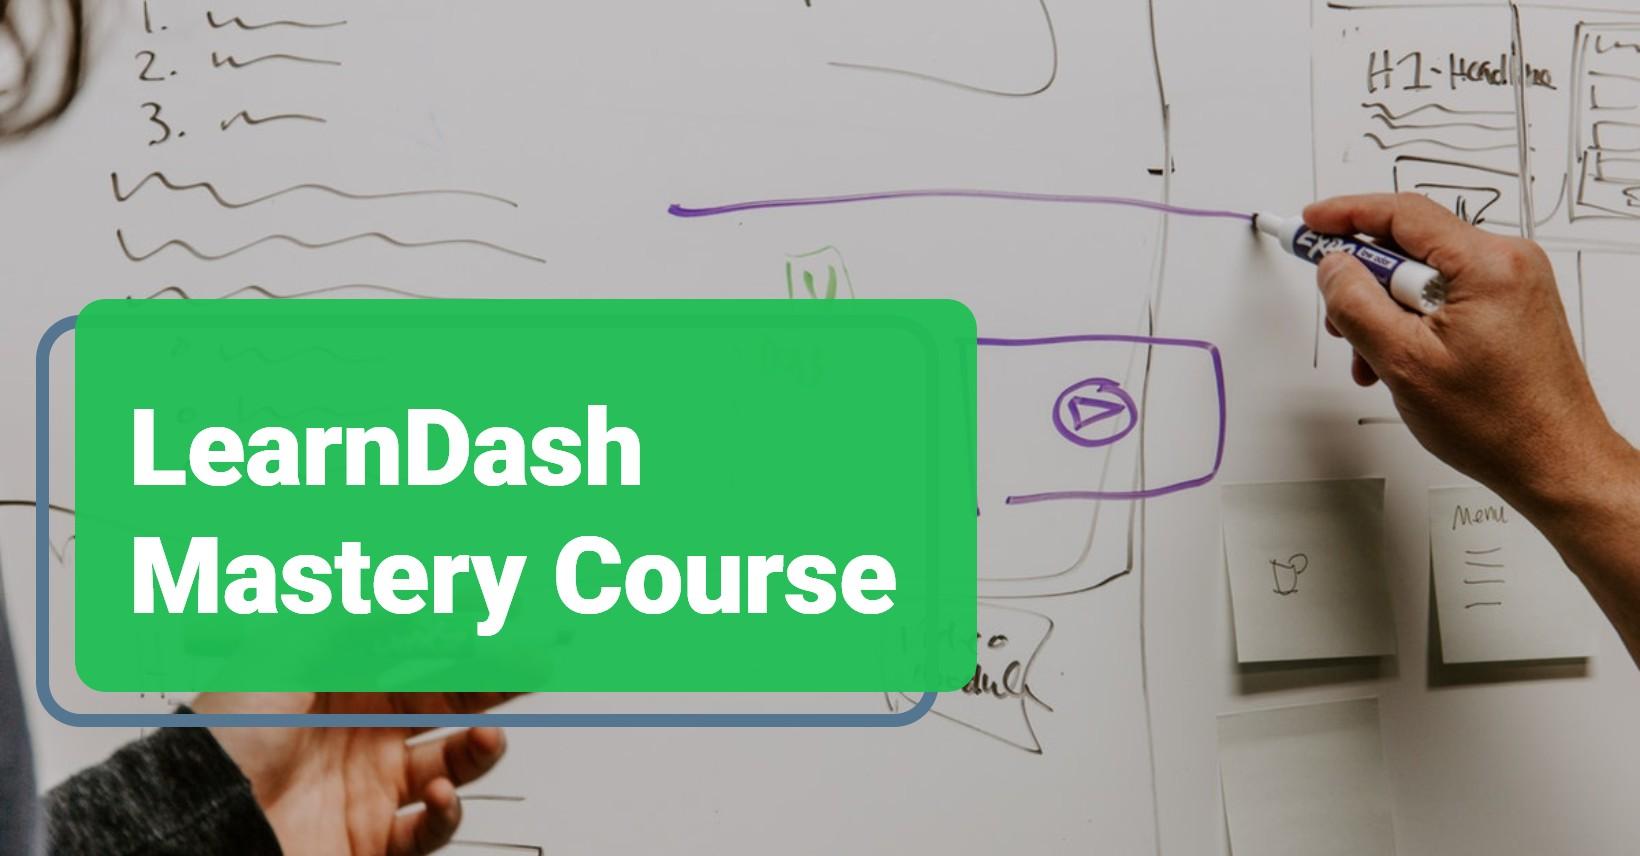 LearnDash Mastery Course2 1 -